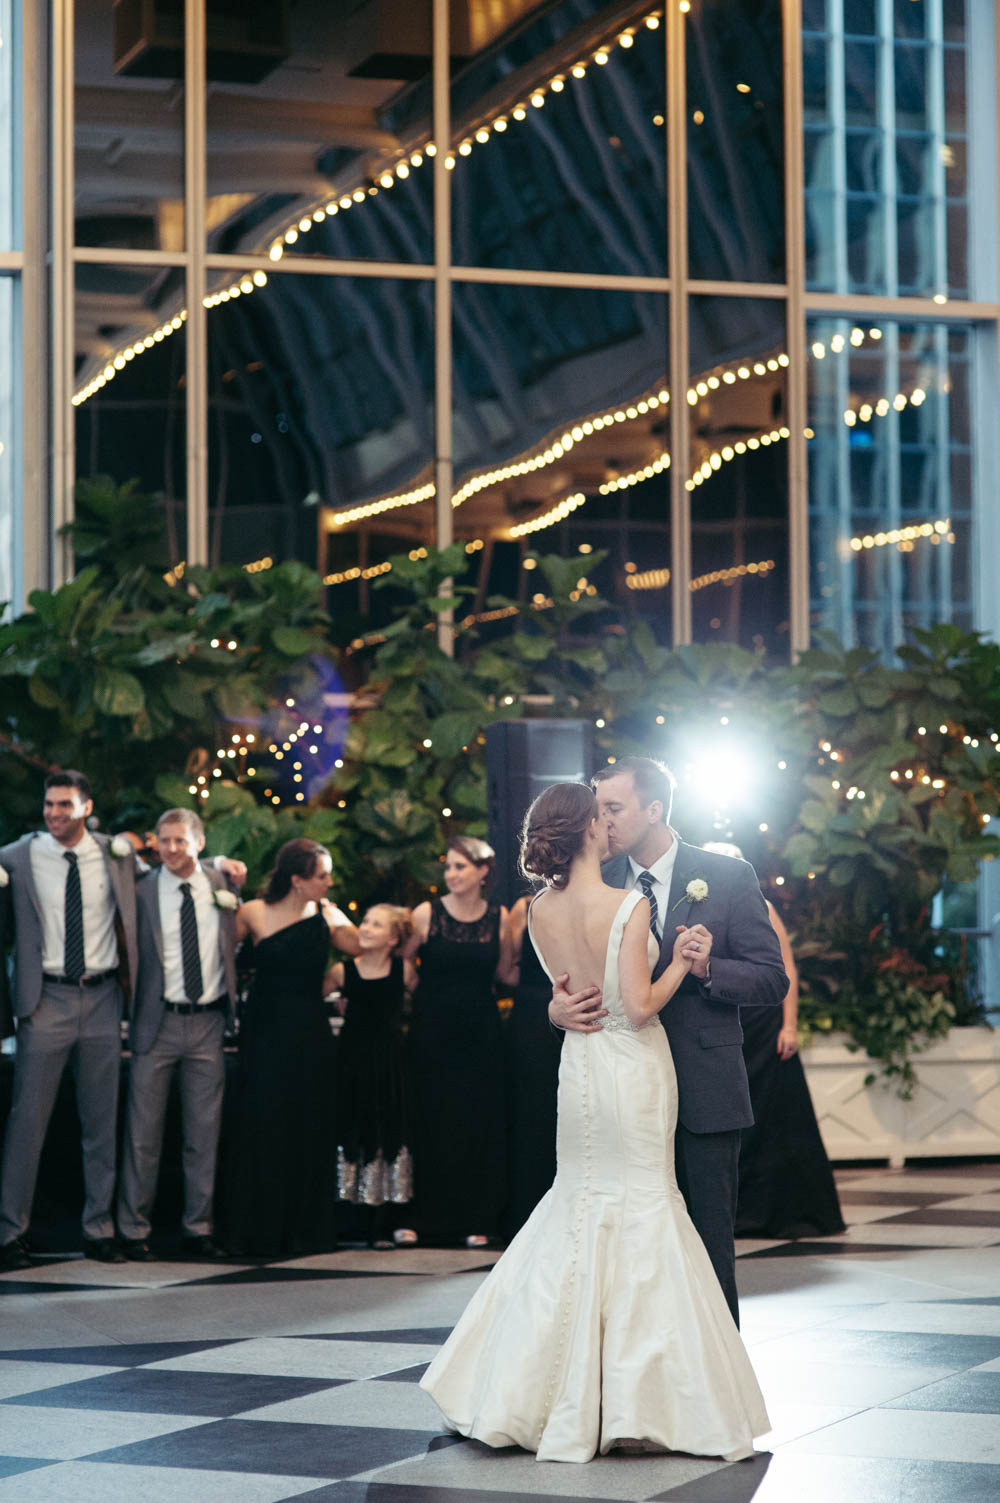 wintergarden-wedding-pittsburgh-121.jpg